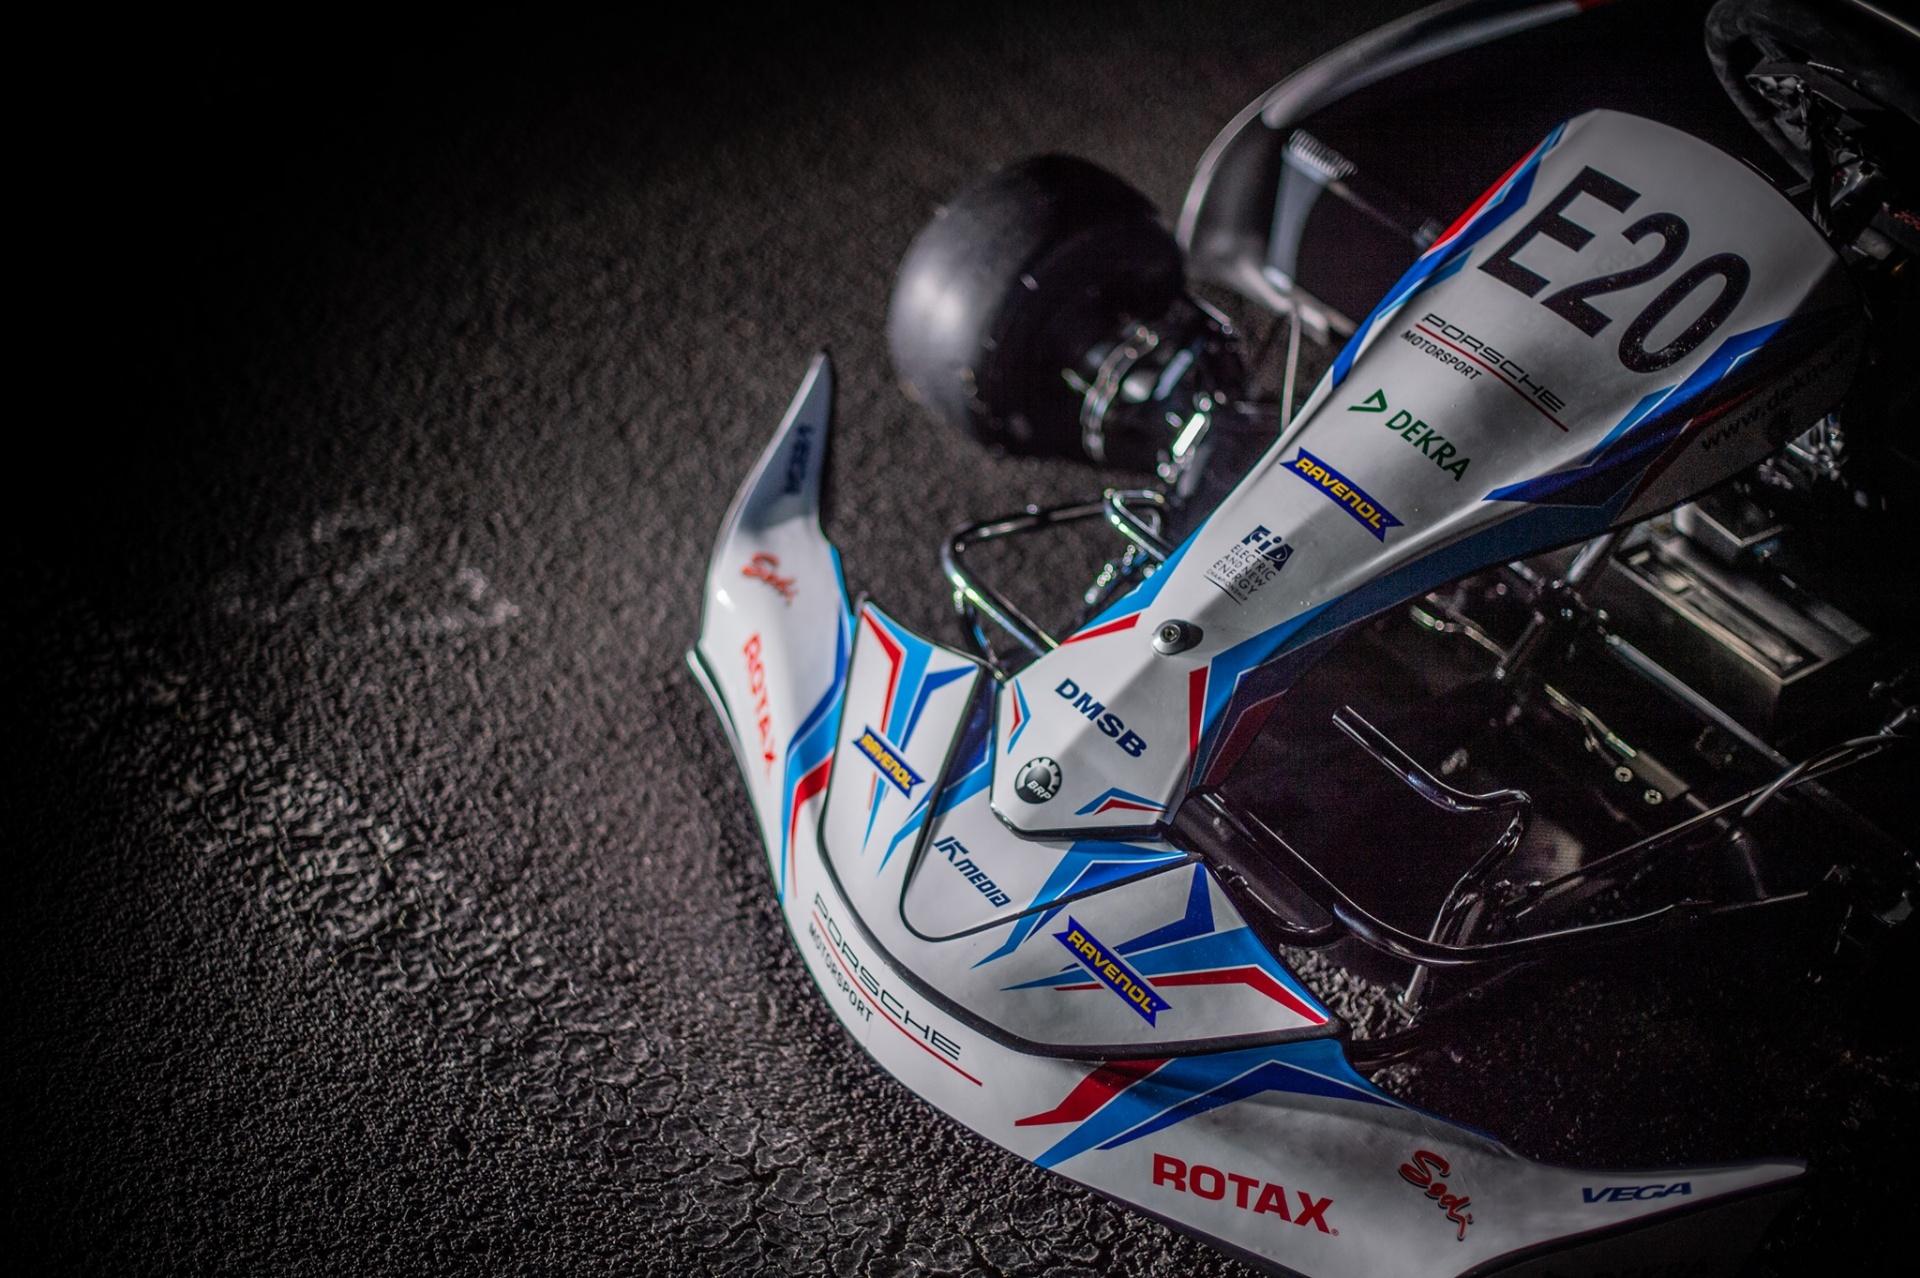 Rotax a la cabeza en la carrera del kart eléctrico